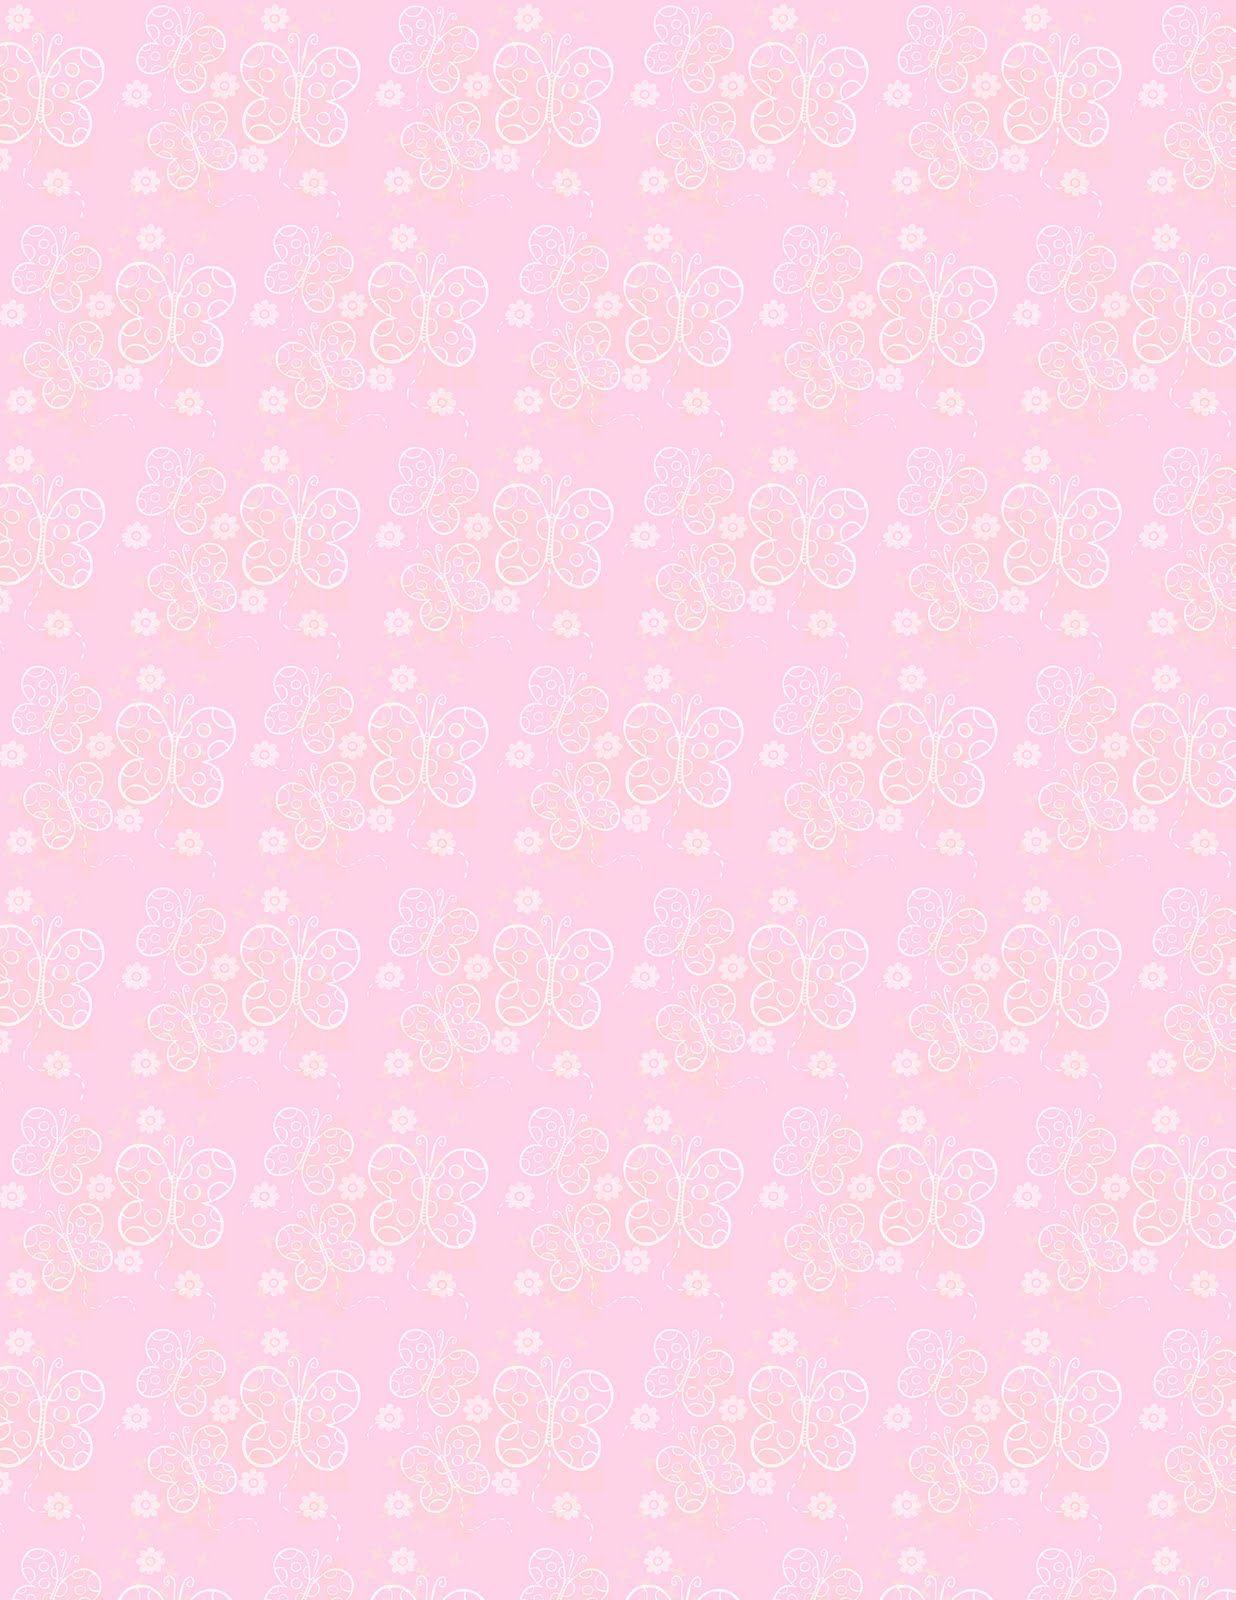 Scrapbook paper dollhouse wallpaper - Images Of Free Scrapbooking Supplies Butterflies Are Pink Scrapbook Paper Wallpaper